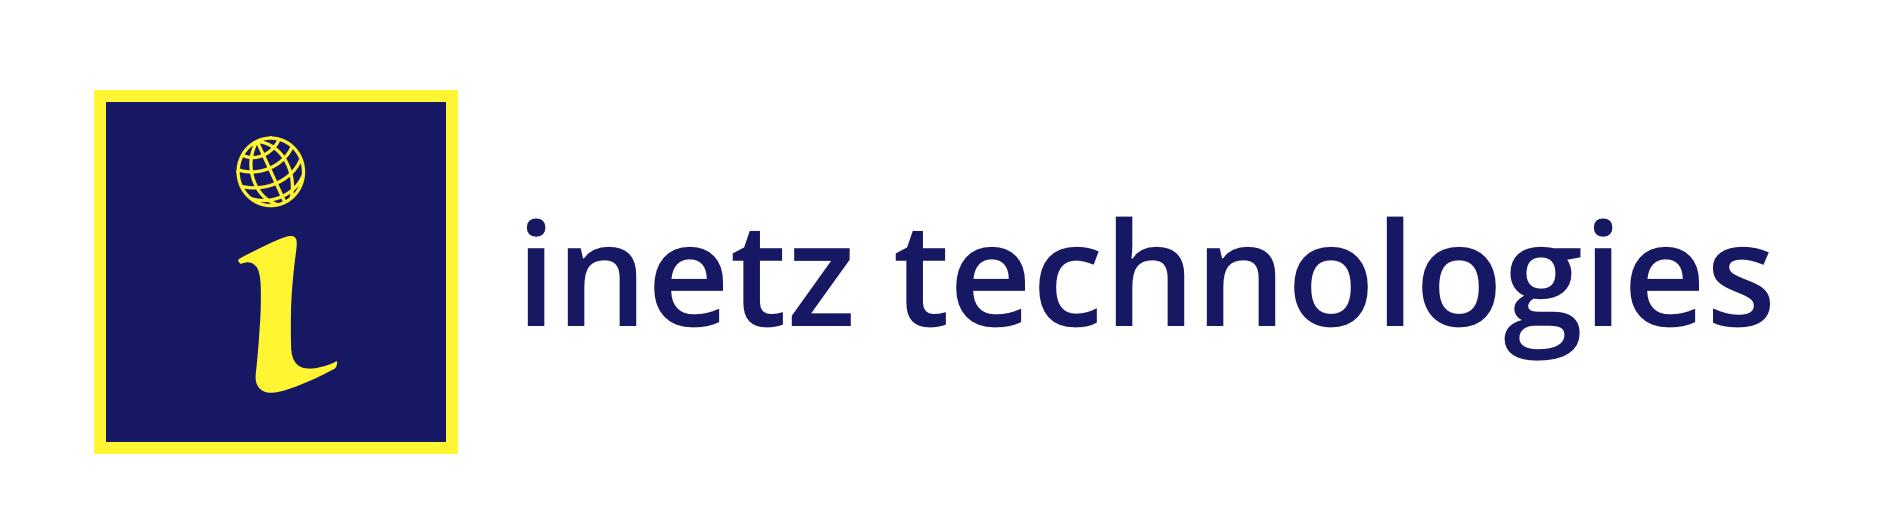 Inetz Technologies